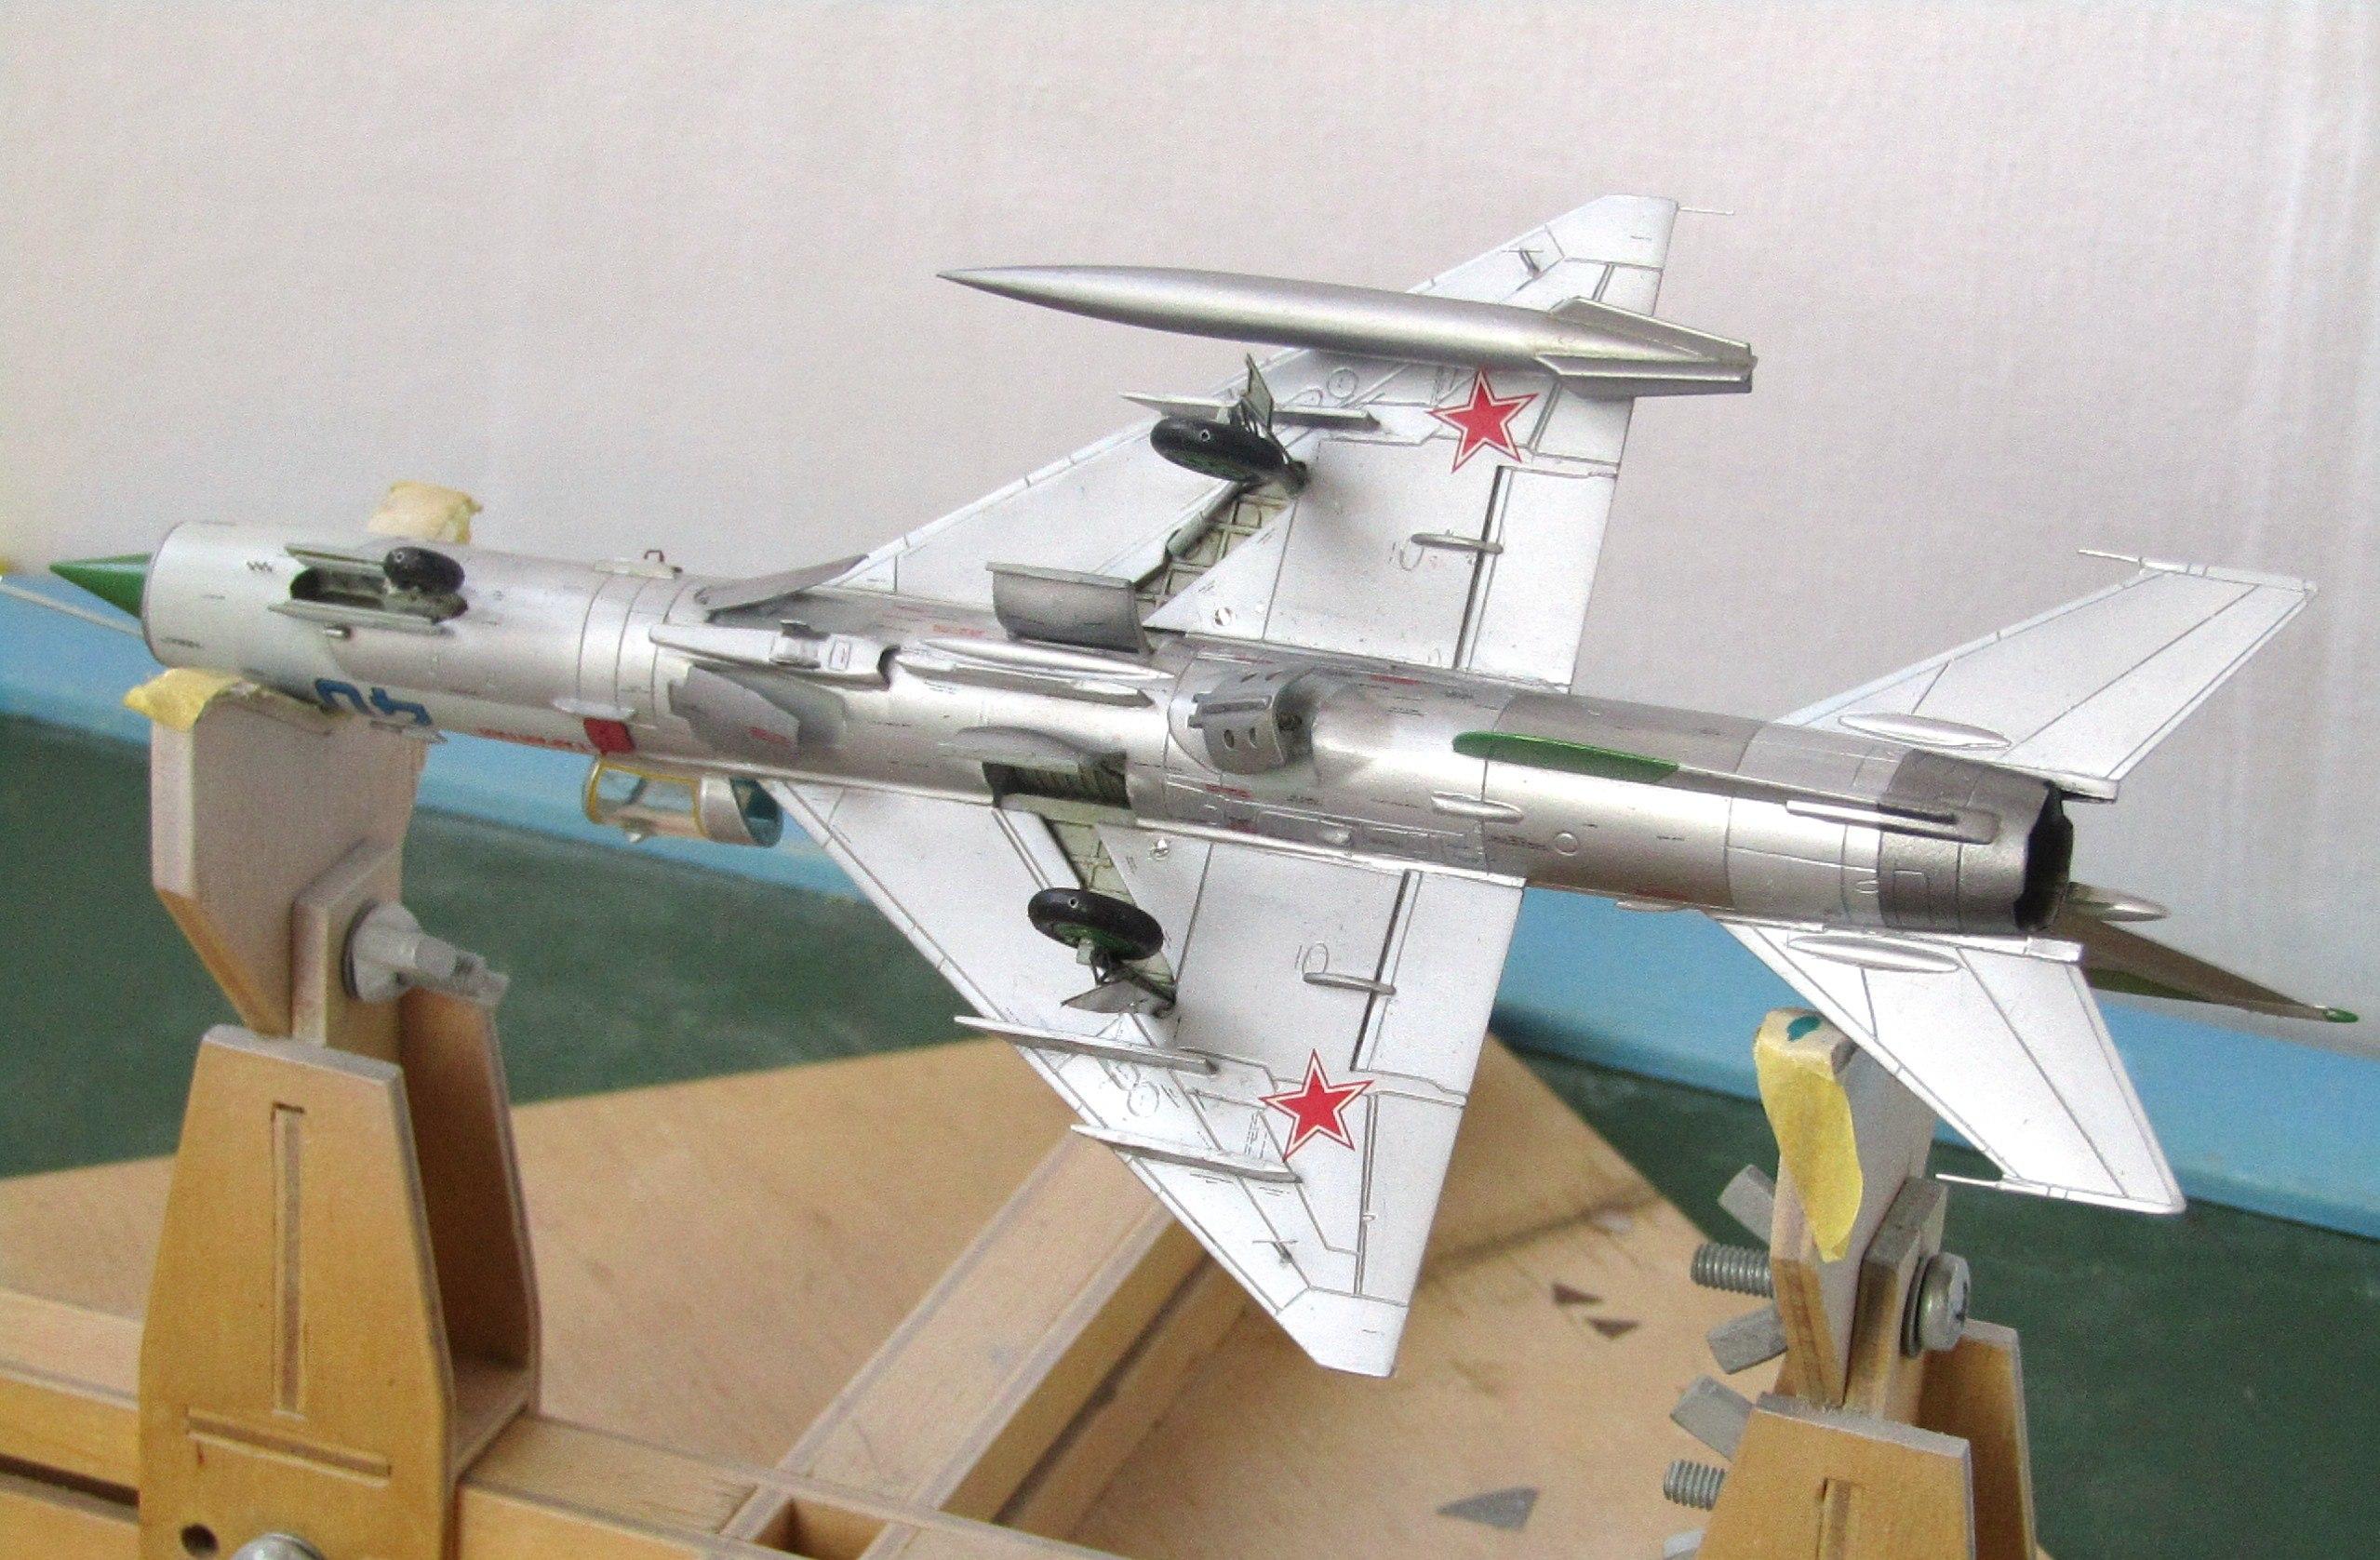 МиГ-21БИС 1/72 (Звезда) PMnB6YW6g1s